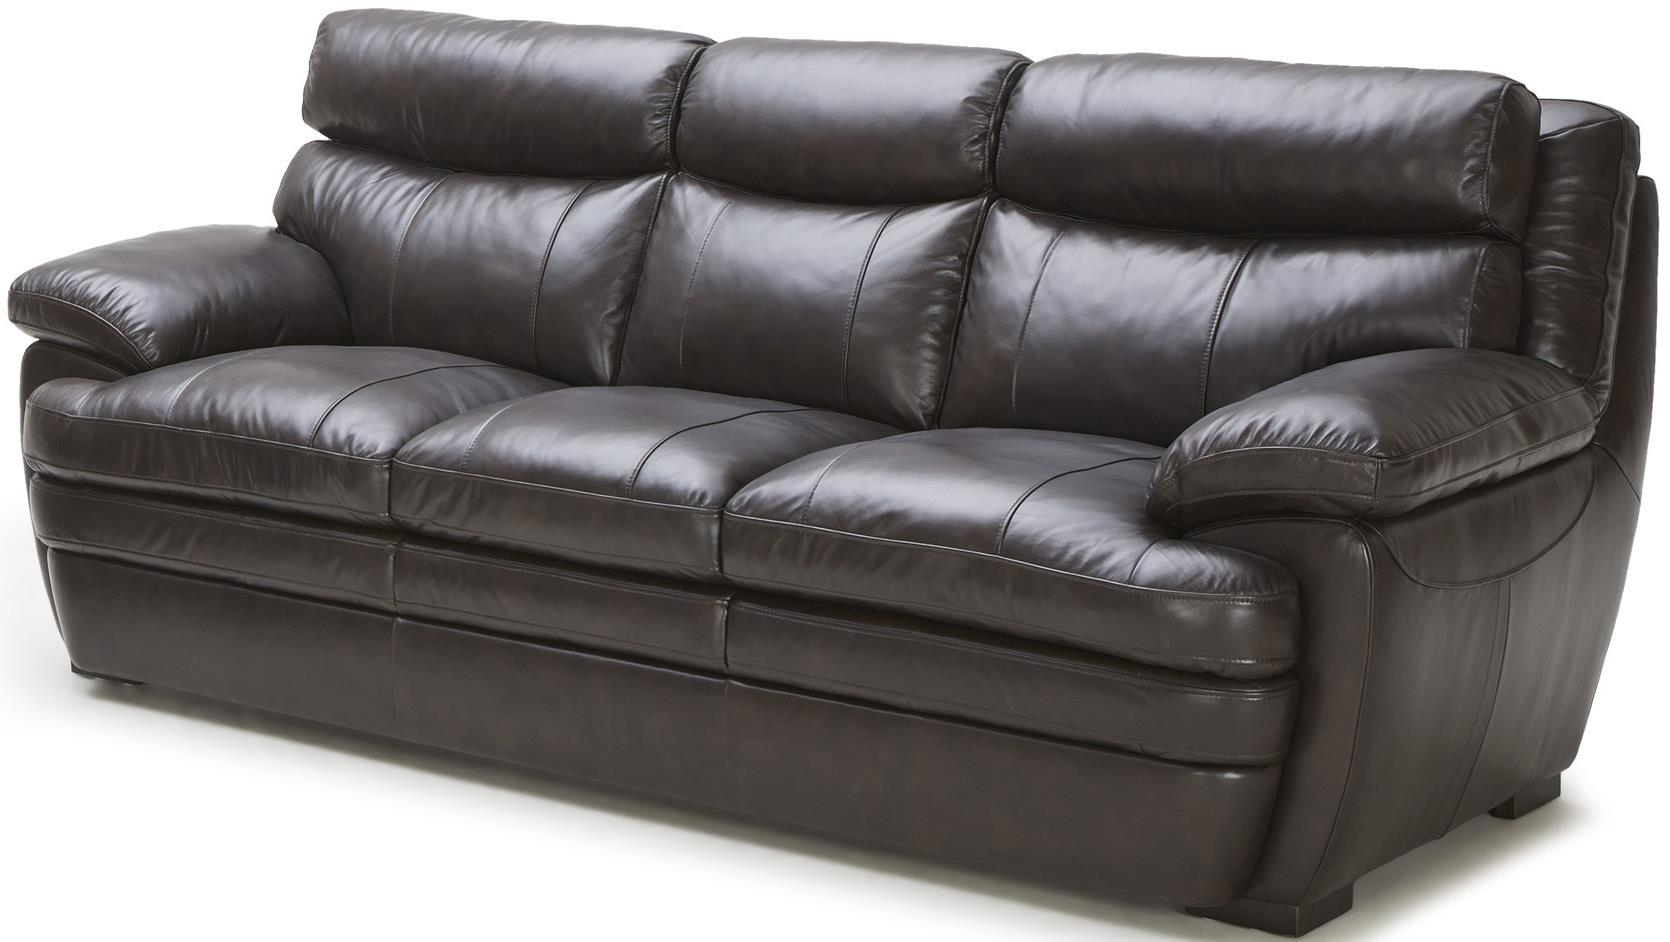 BFW Lifestyle 5073 Sofa - Item Number: 5073-3-2A-L2902DU